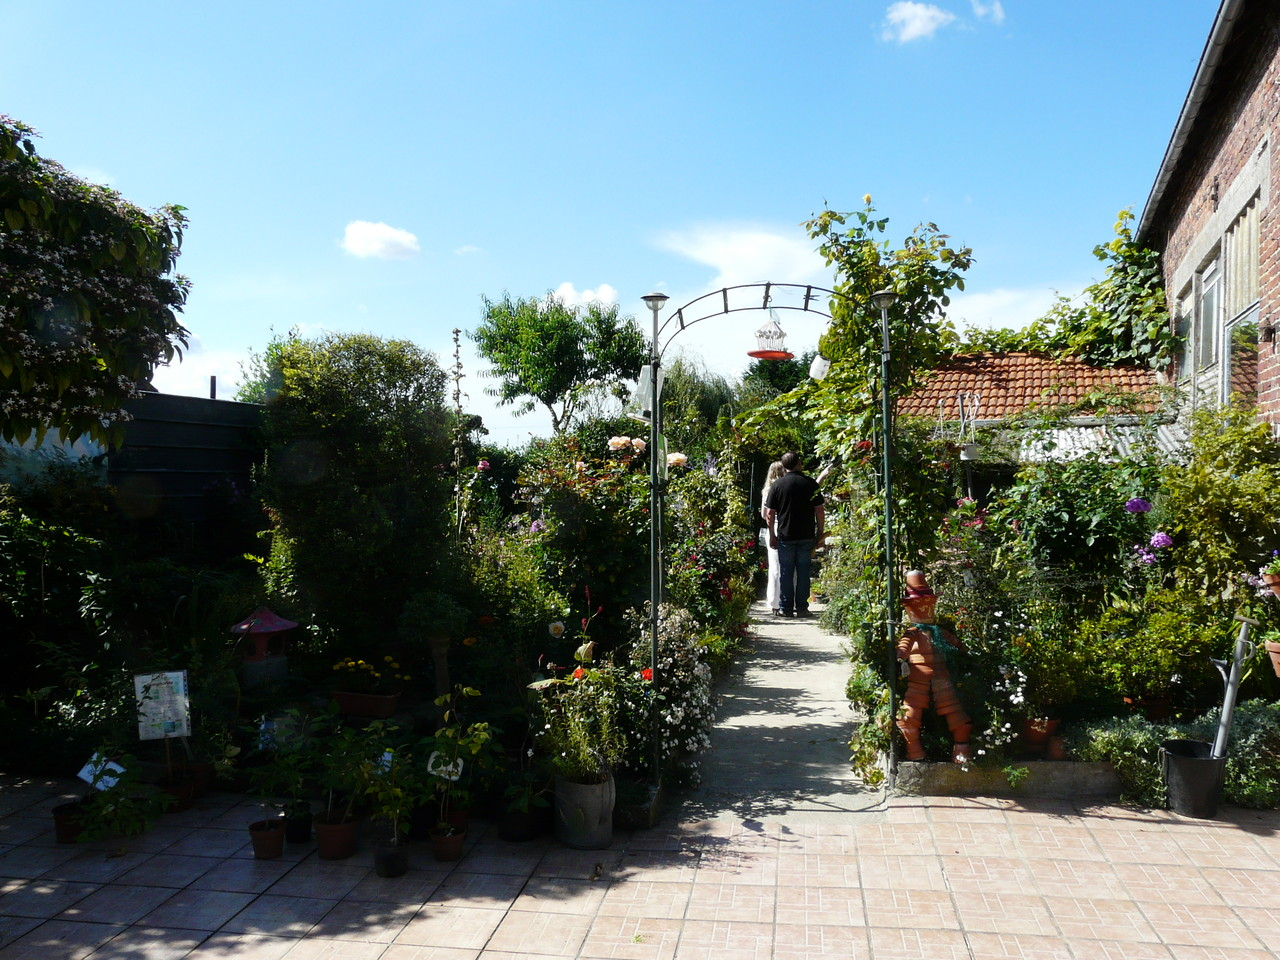 La visite du jardin